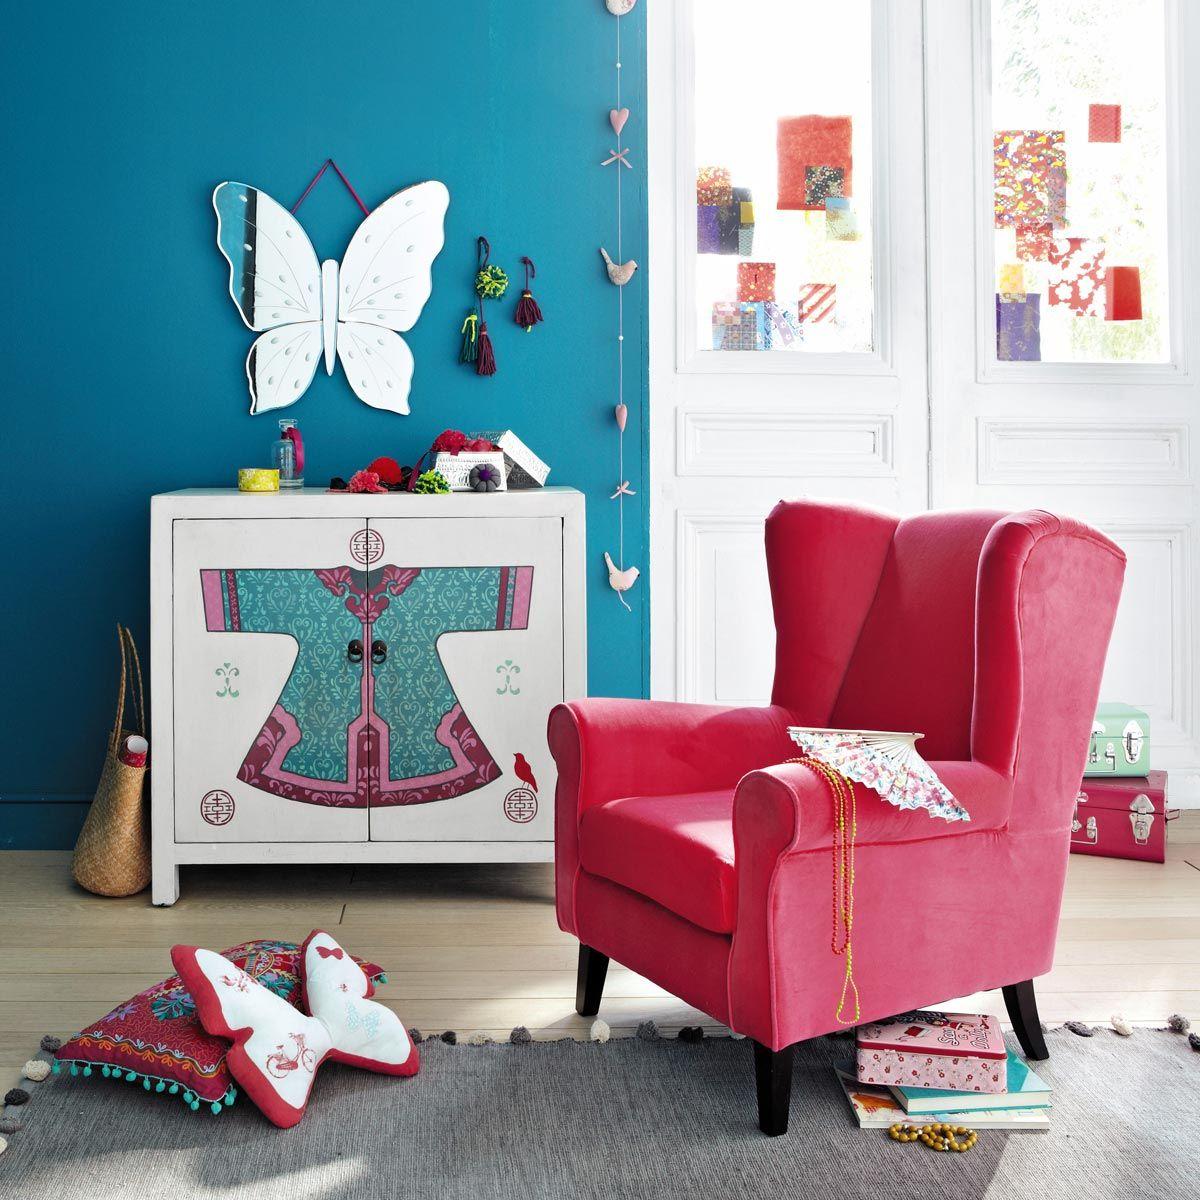 Tappeto grigio in cotone 120x180 cm Roze fluweel